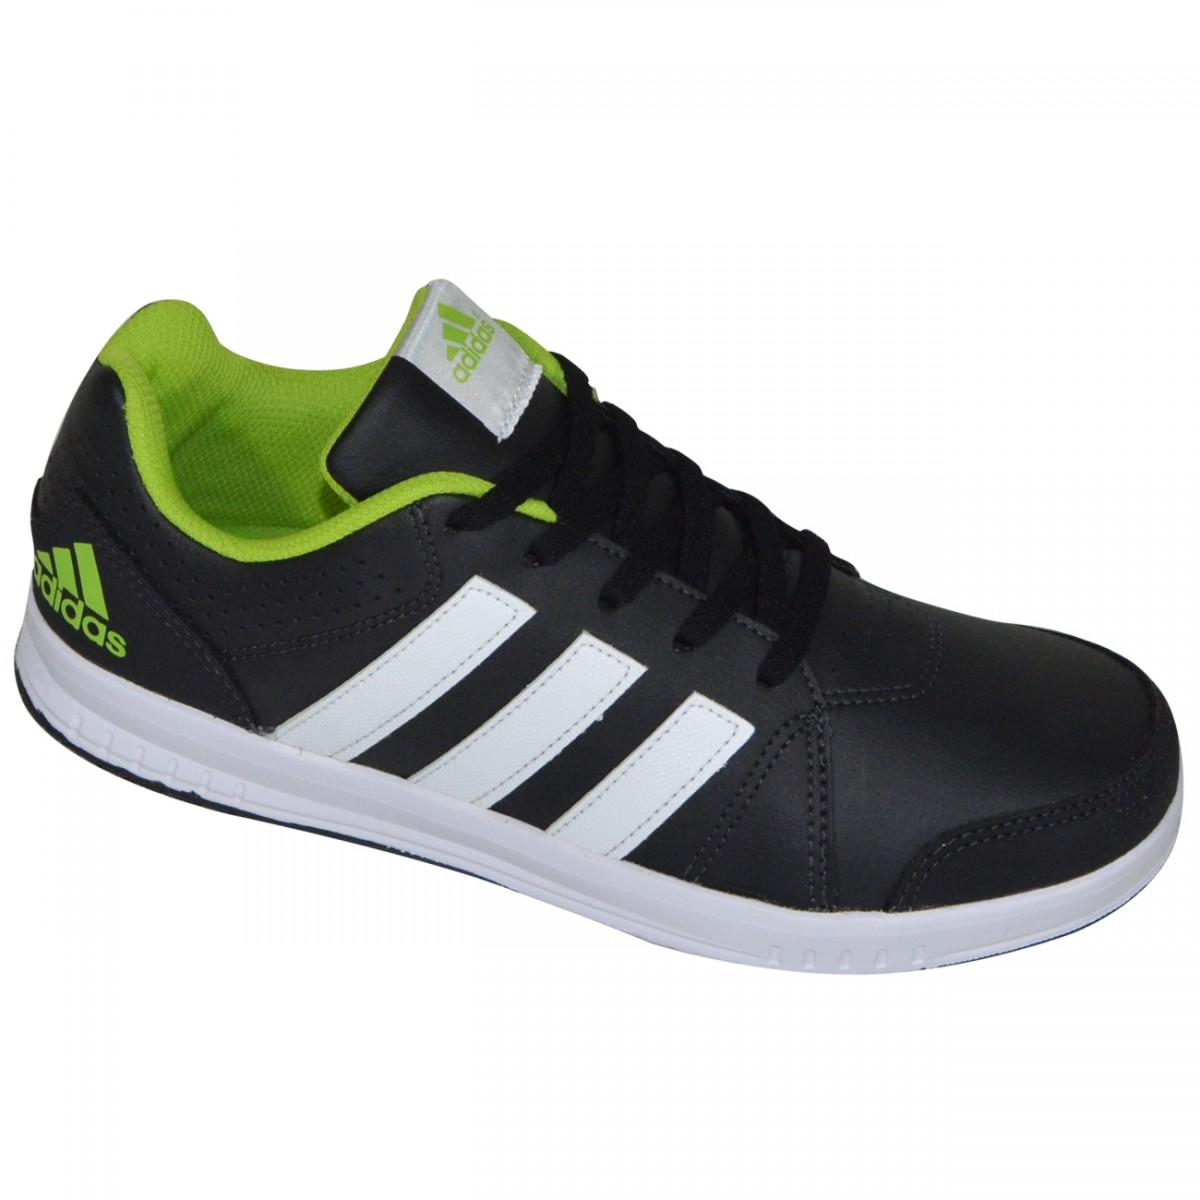 a9d6f4e63f5 Tenis Adidas LK Trainer 7 K Juvenil AF3973 - Preto Branco - Chuteira Nike